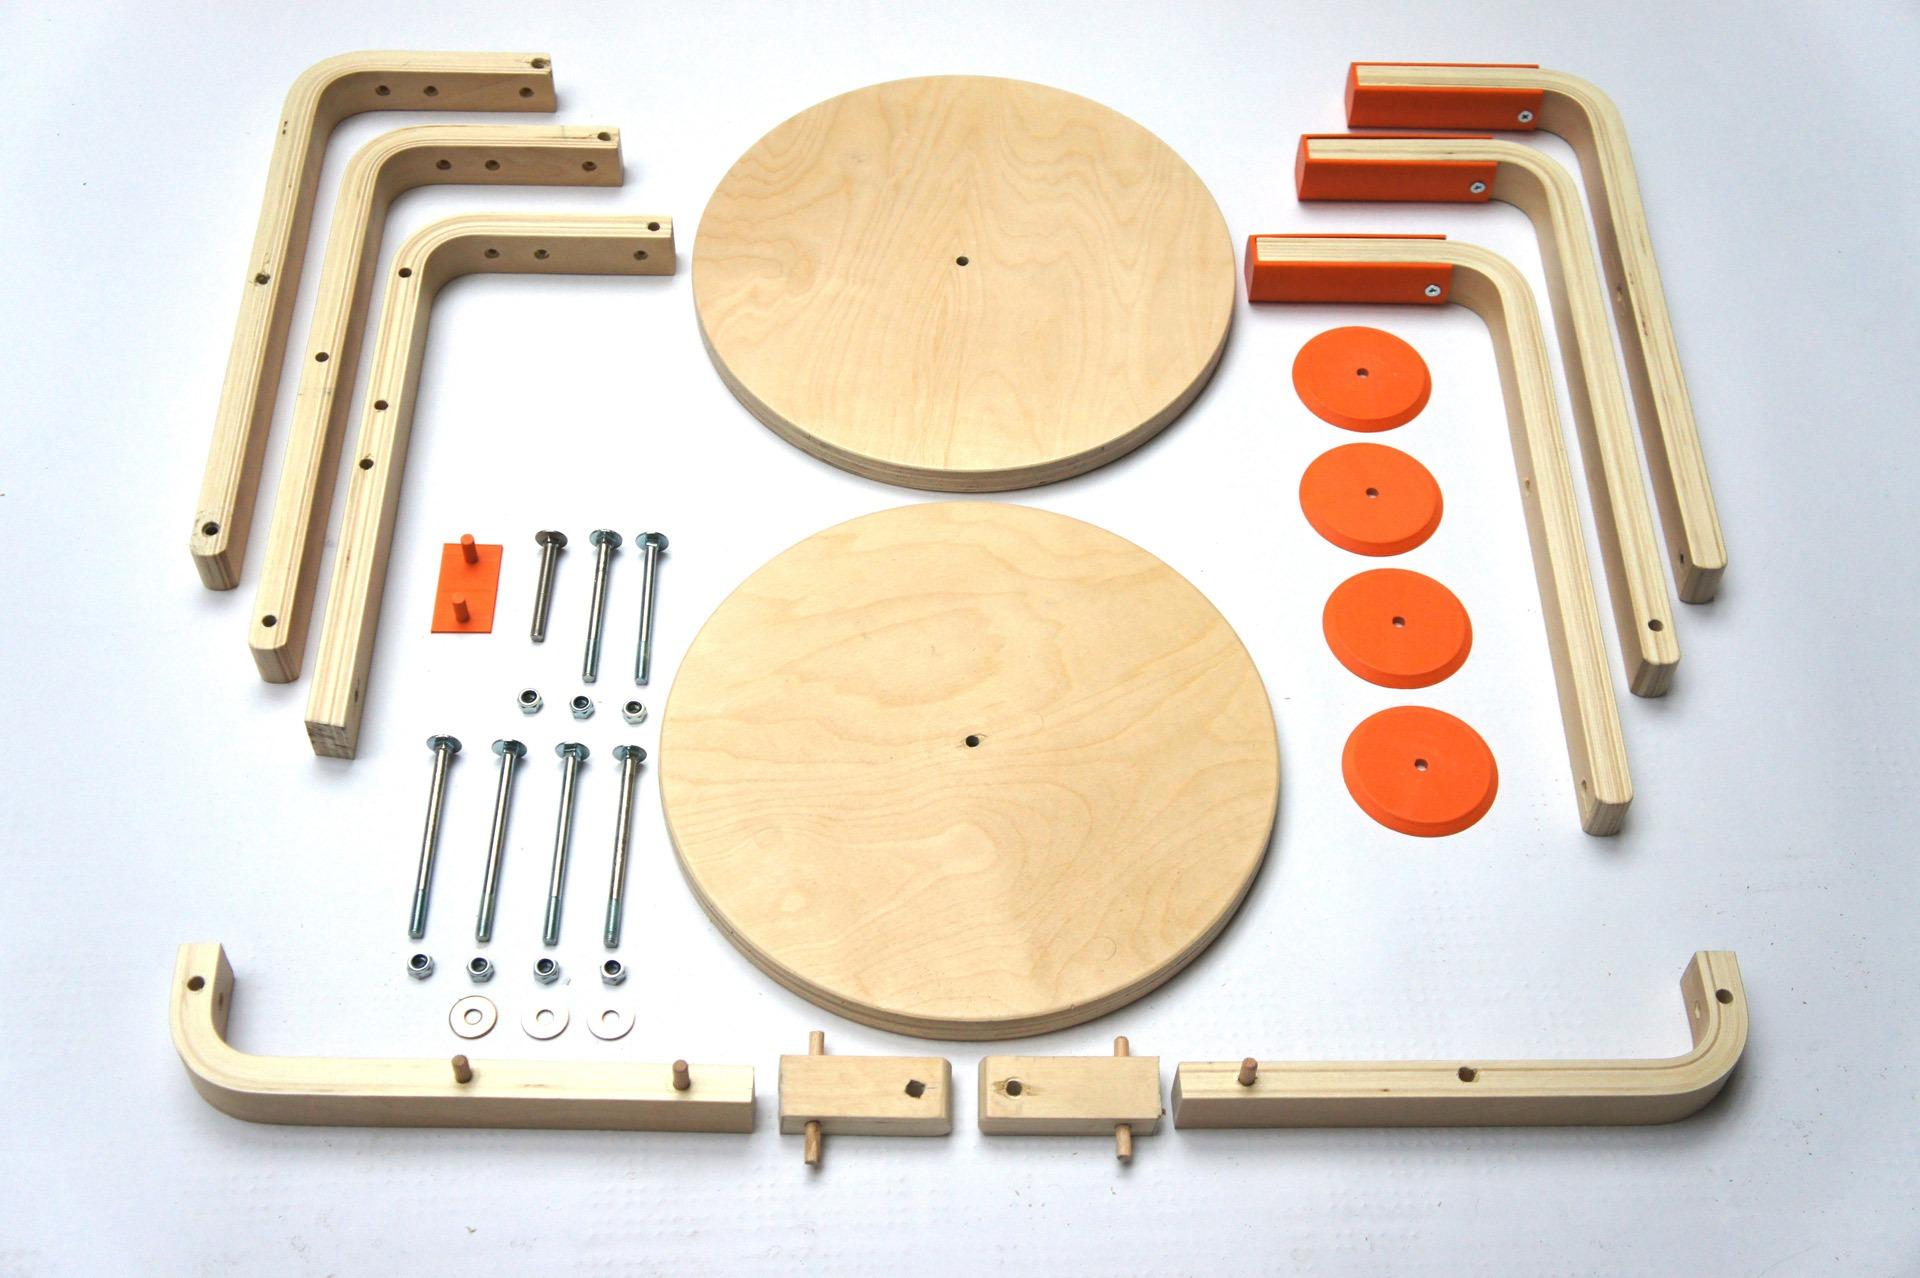 un tabouret ikea modifi pour construire un v lo. Black Bedroom Furniture Sets. Home Design Ideas